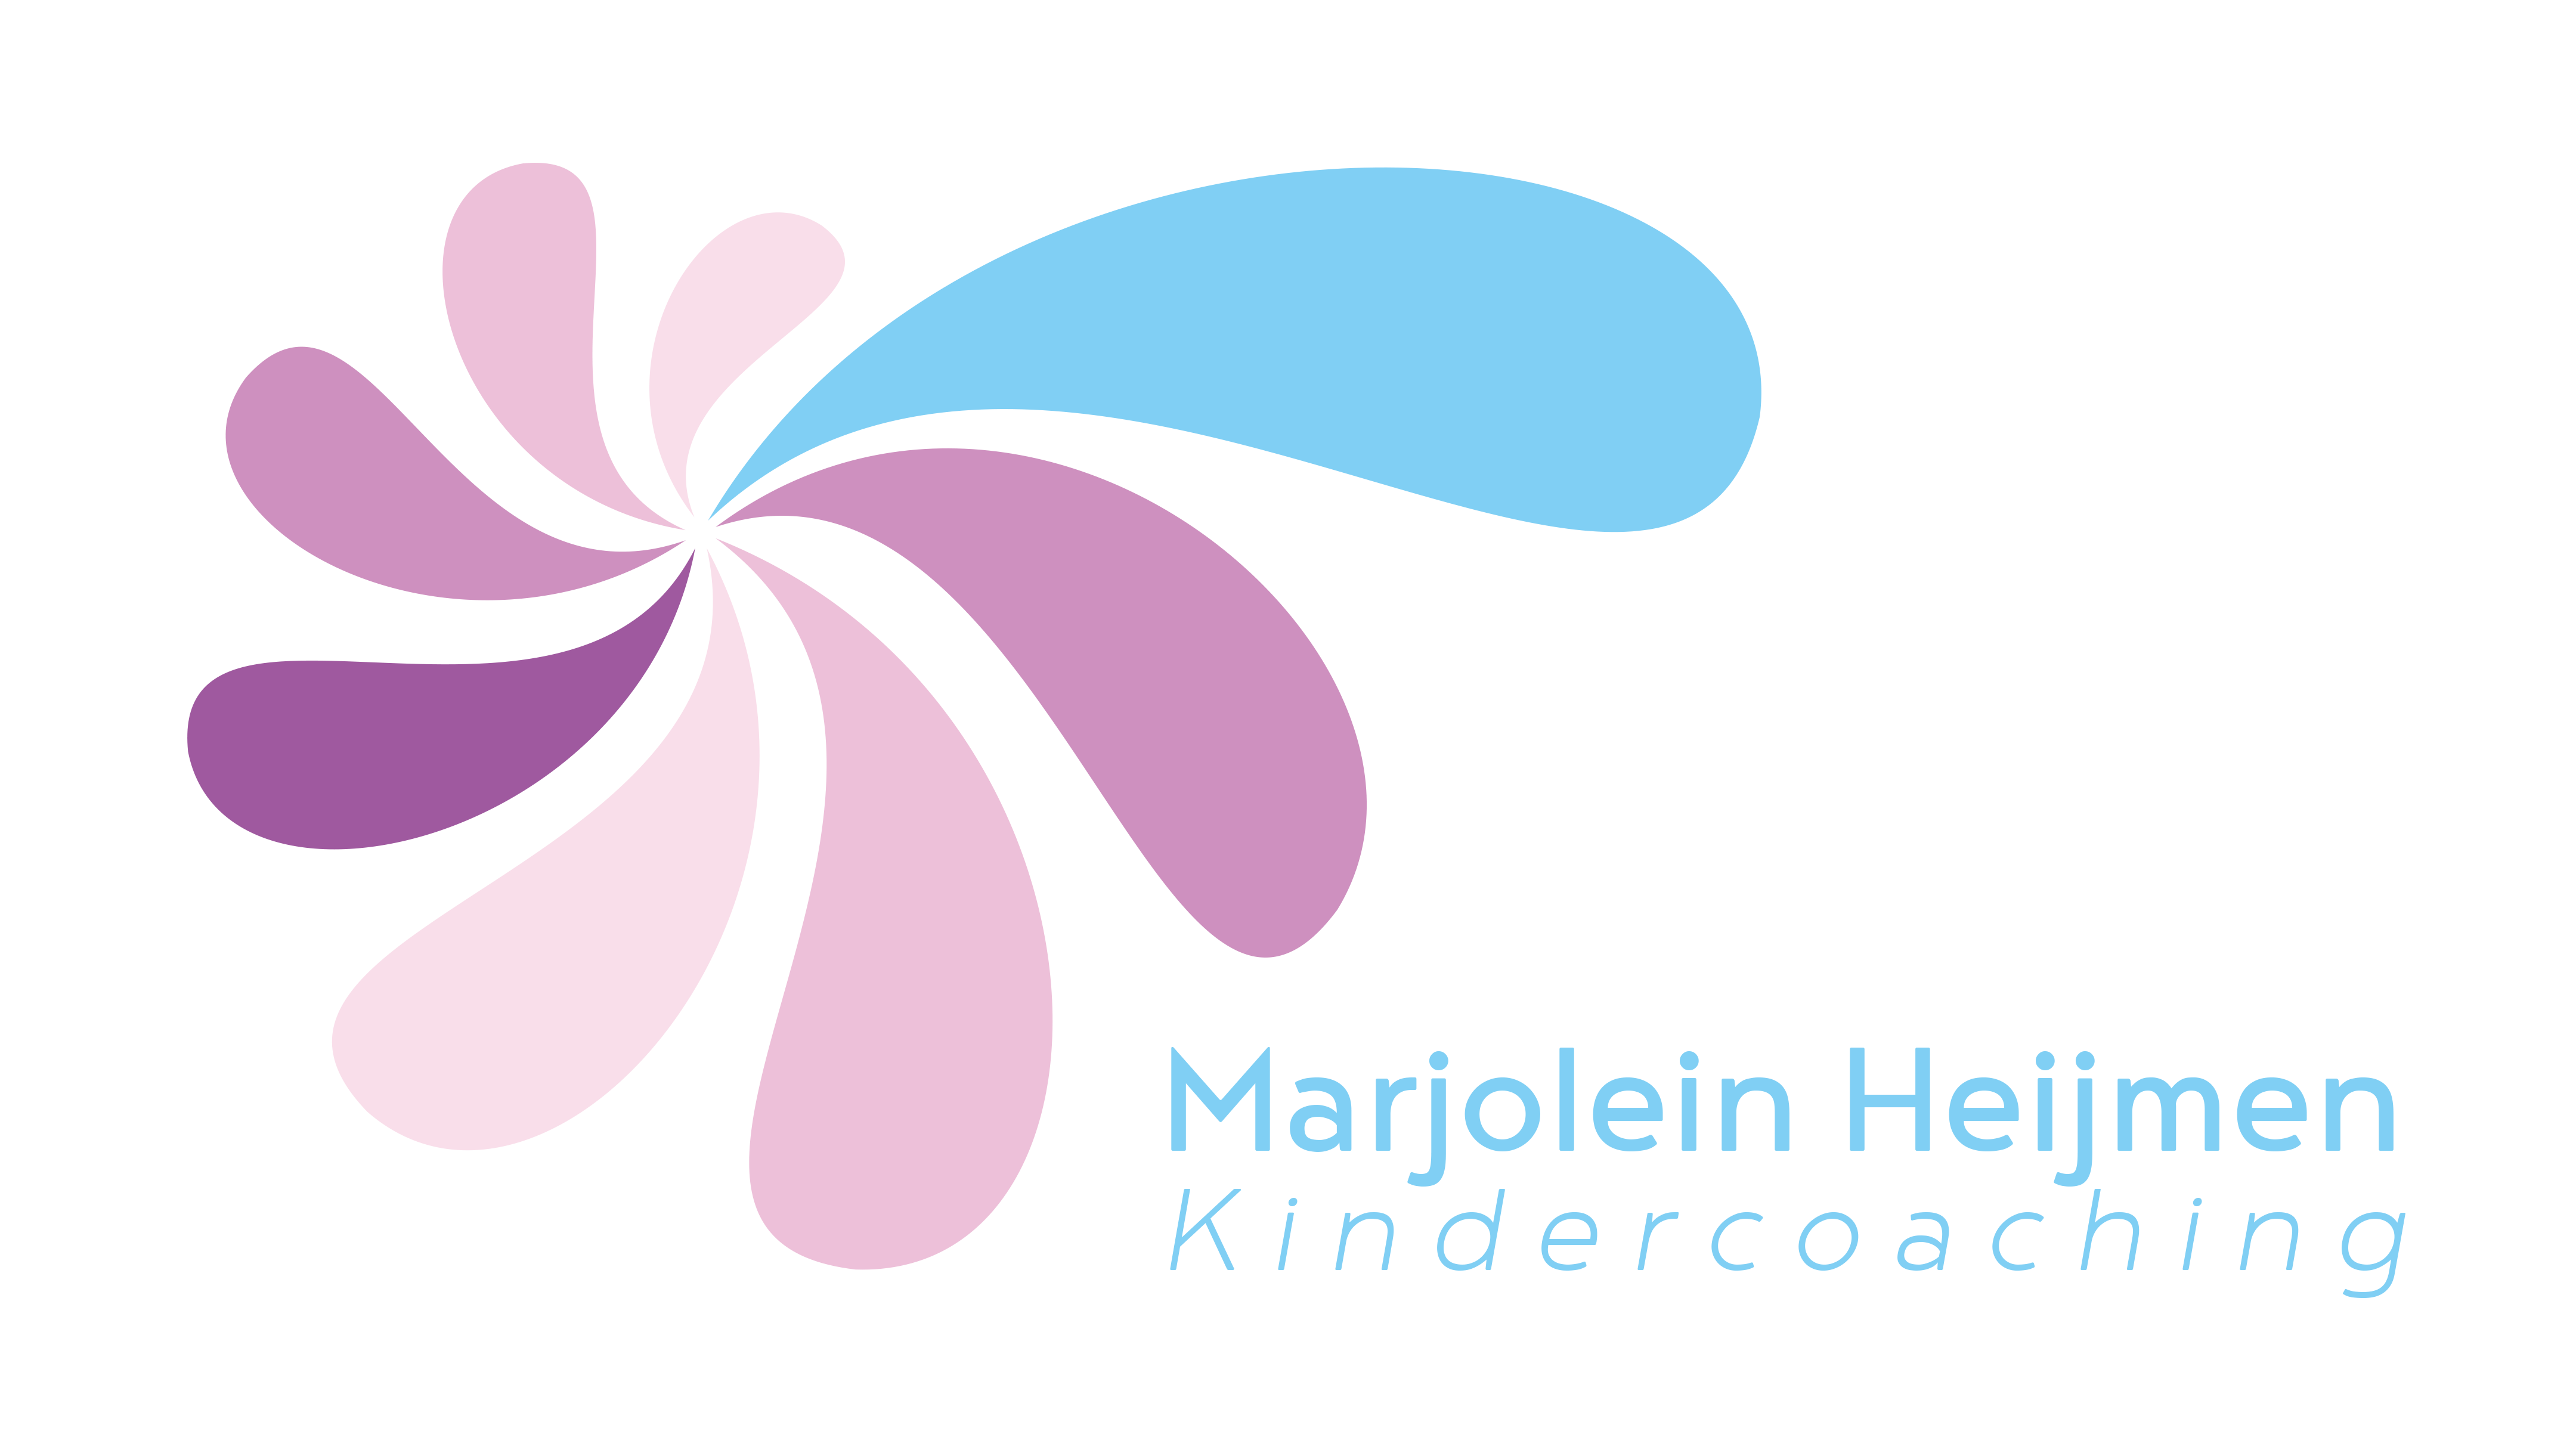 Marjolein Heijmen